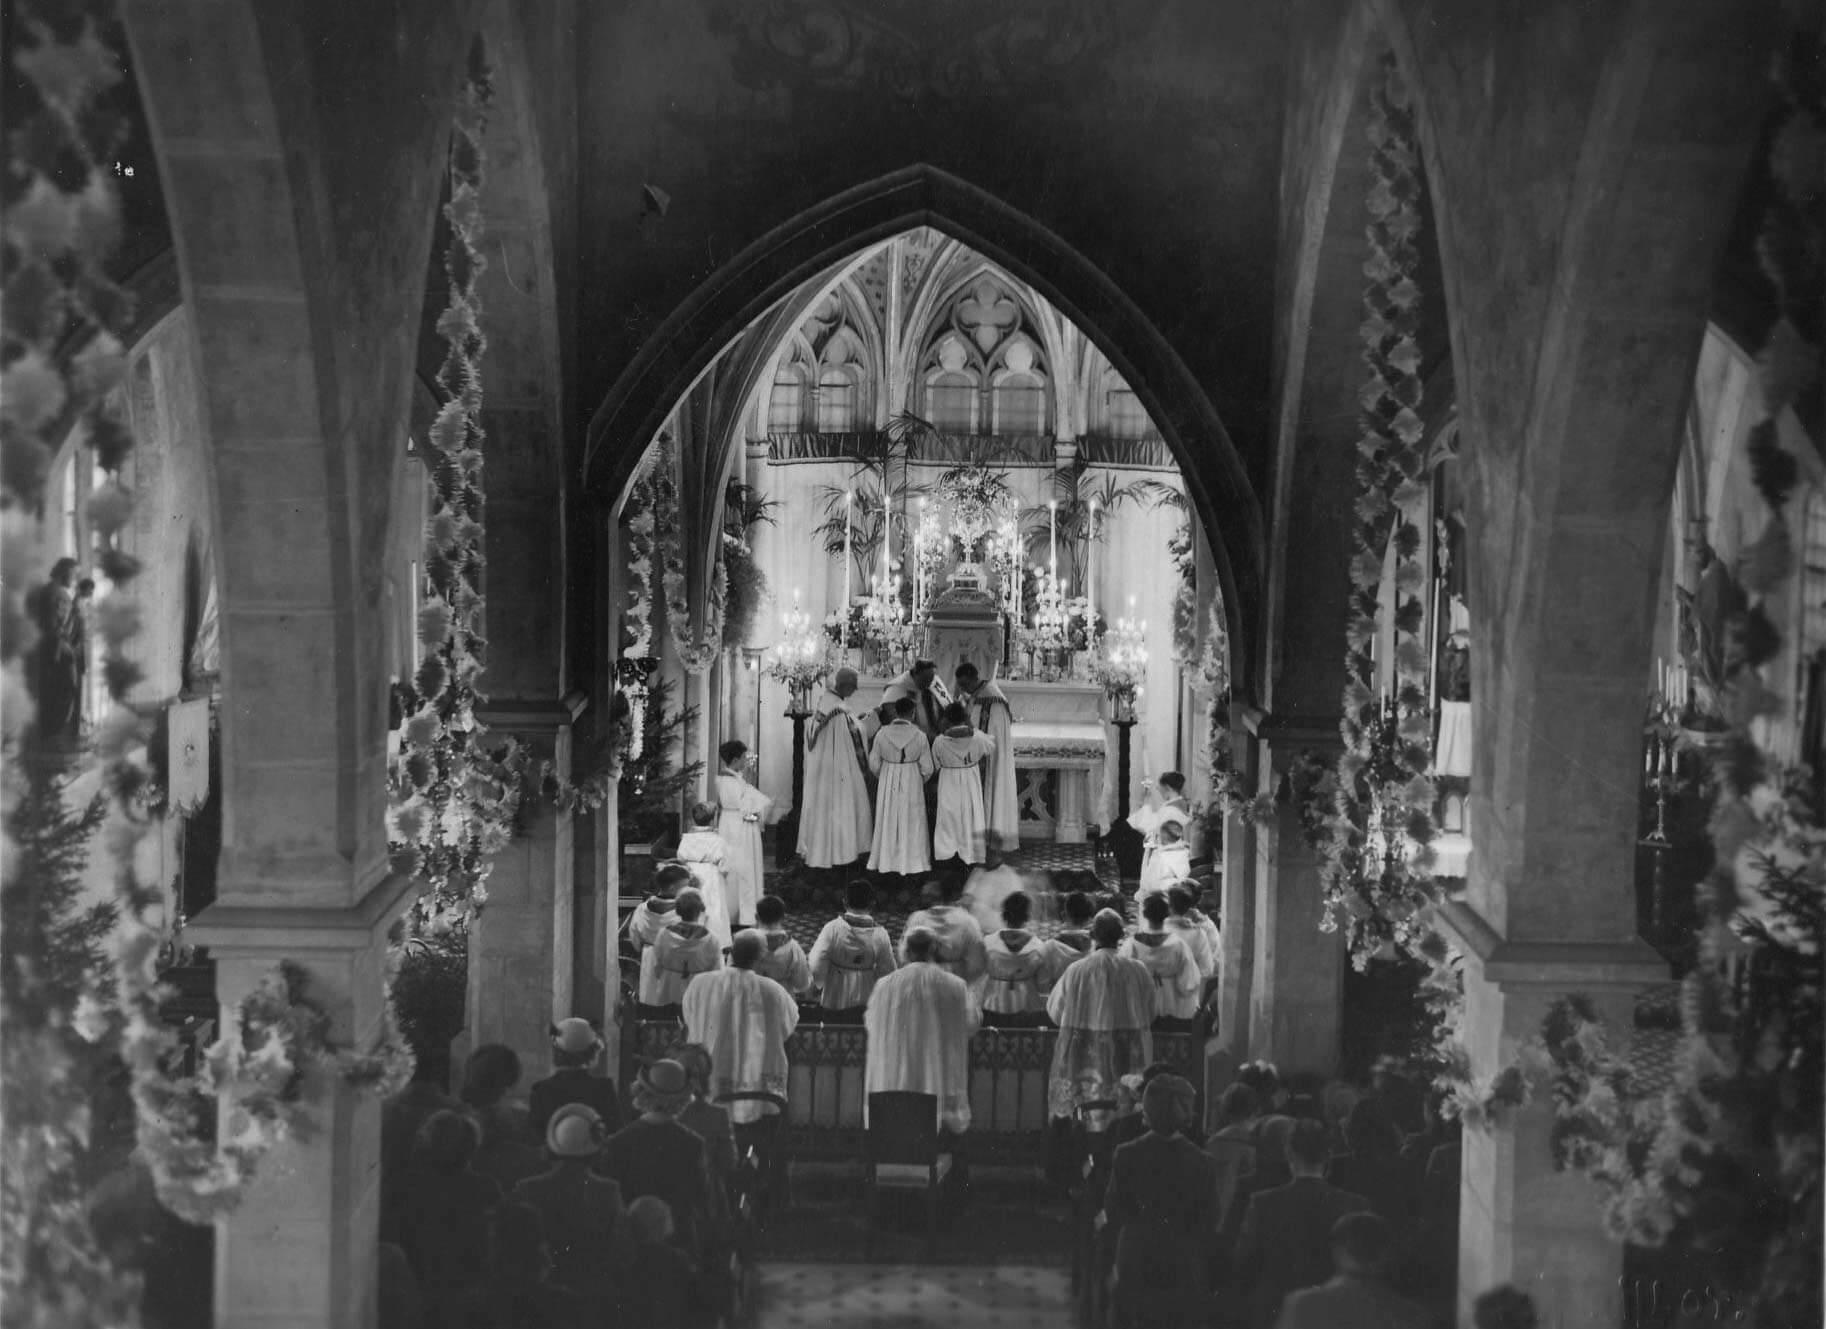 Eglise de Gravelotte